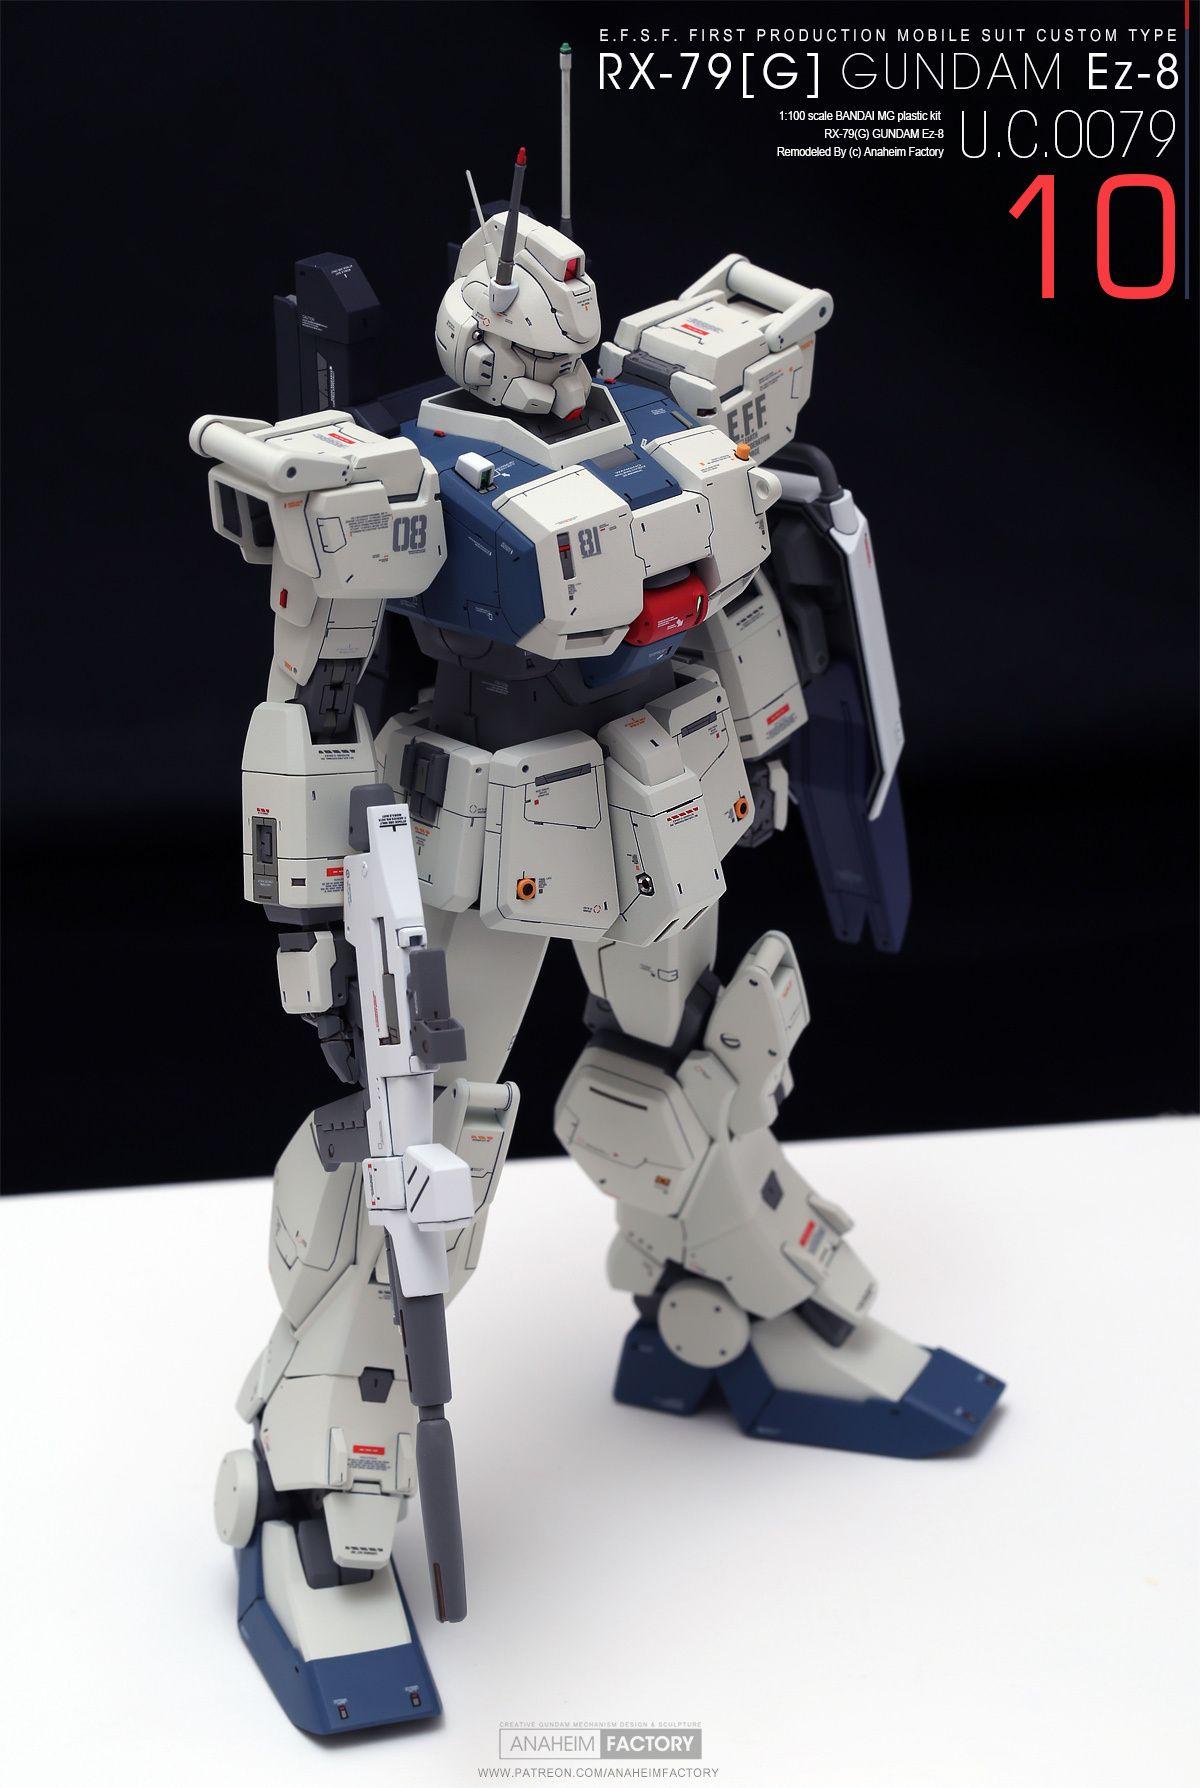 Pin on Mobile Suit Gundam The 08th MS Team / 機動戦士ガンダム 第08MS小隊